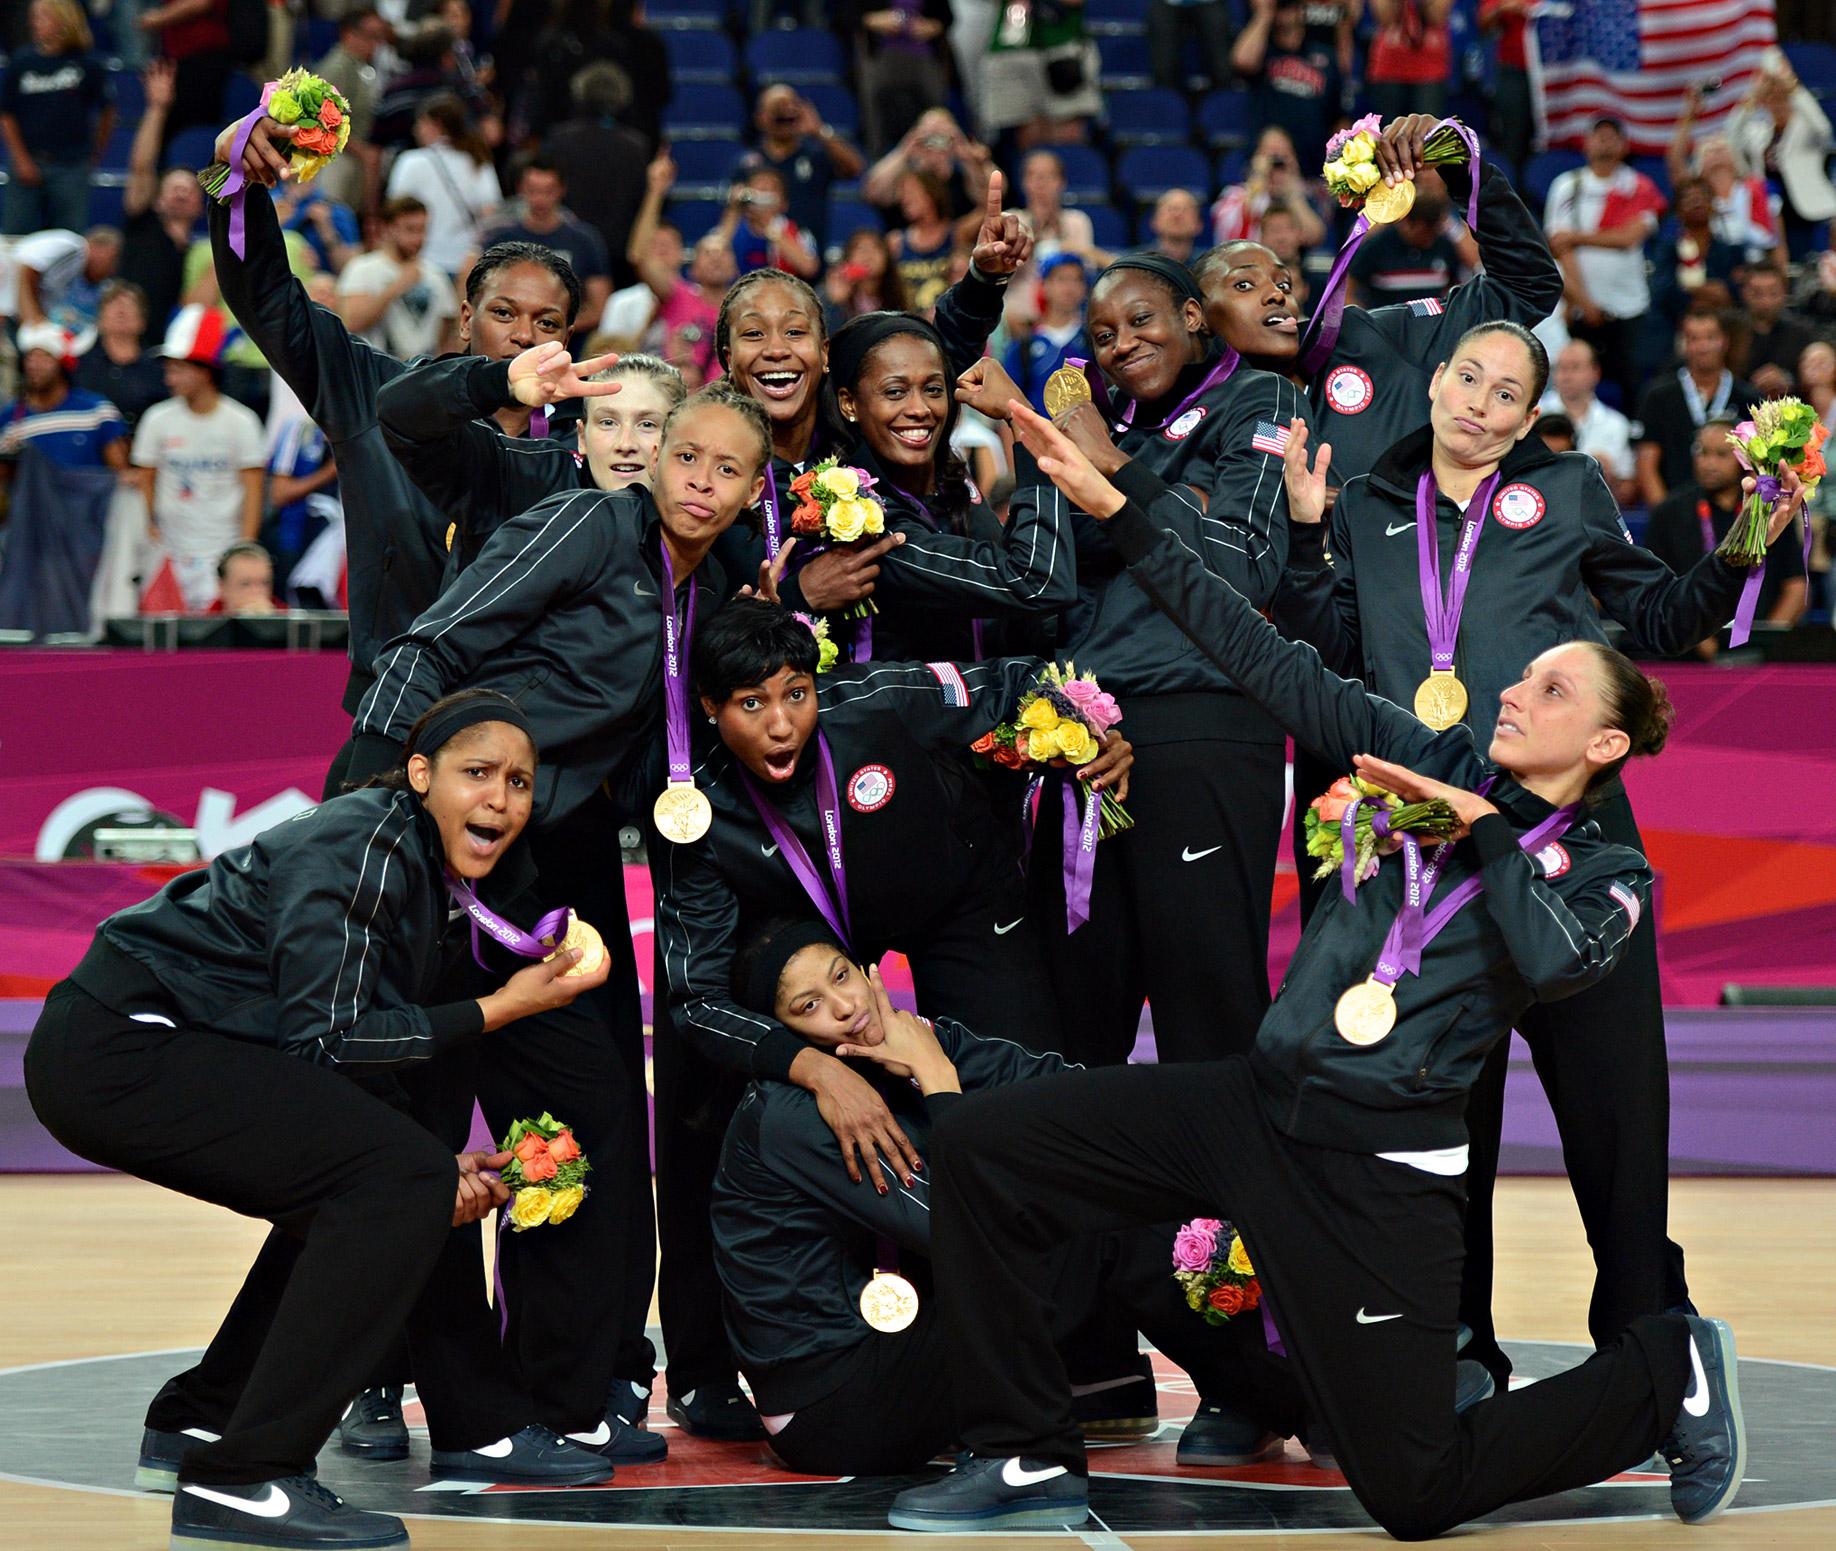 U.S. Women's Basketball